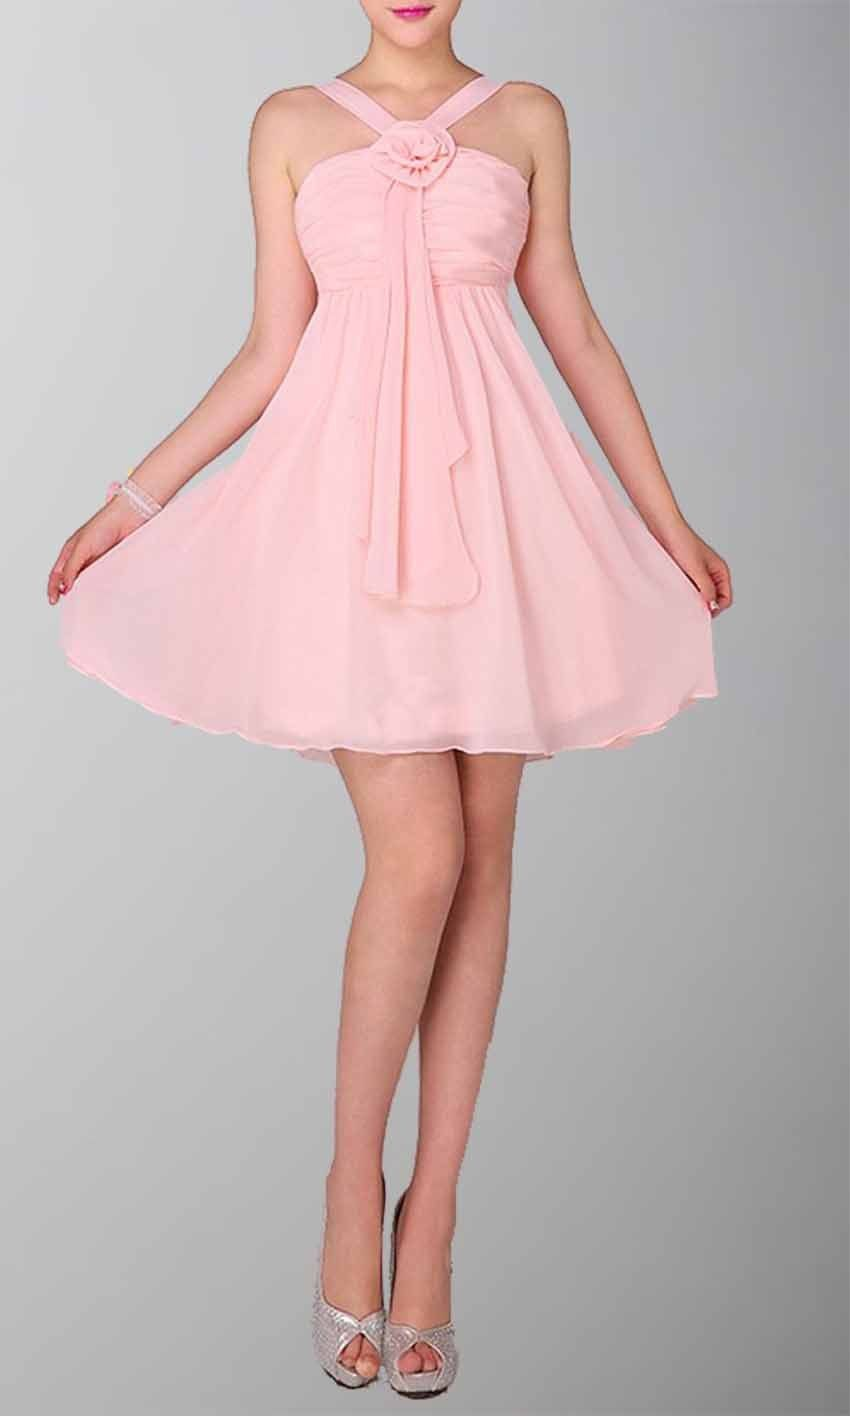 cute halte girly pink graduation dresses KSP087  84976cb43